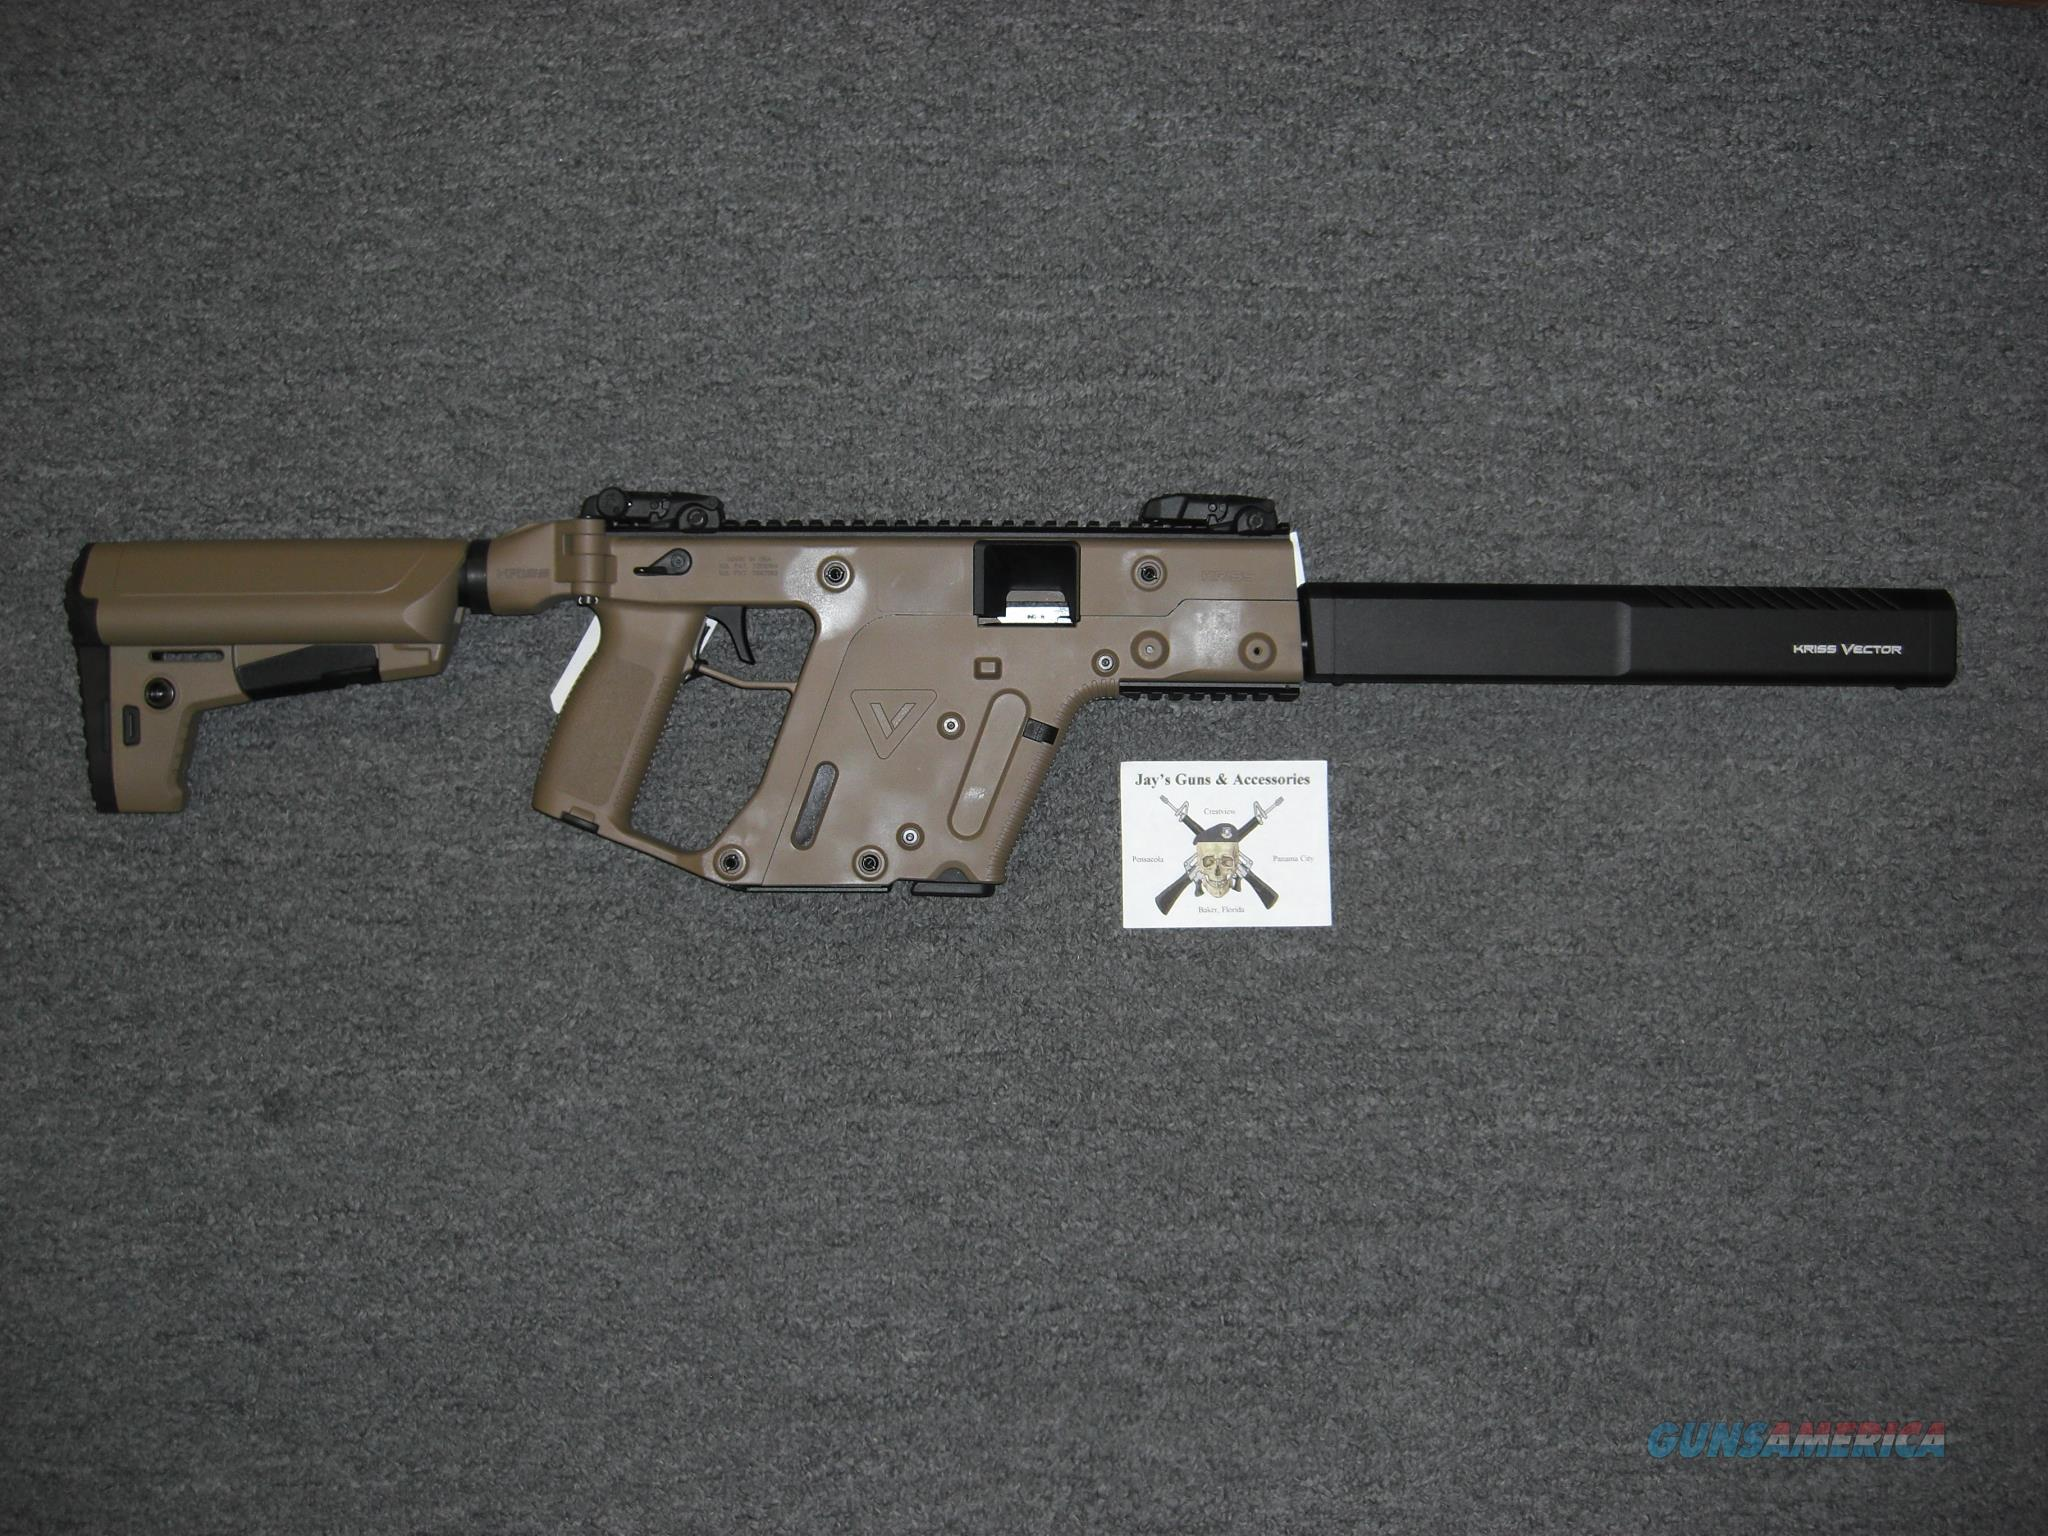 Kriss Vector CRB Gen 2 w/FDE Finish Uses Glock 17 Mags & Fake Silencer  Guns > Rifles > Kriss Tactical Rifles